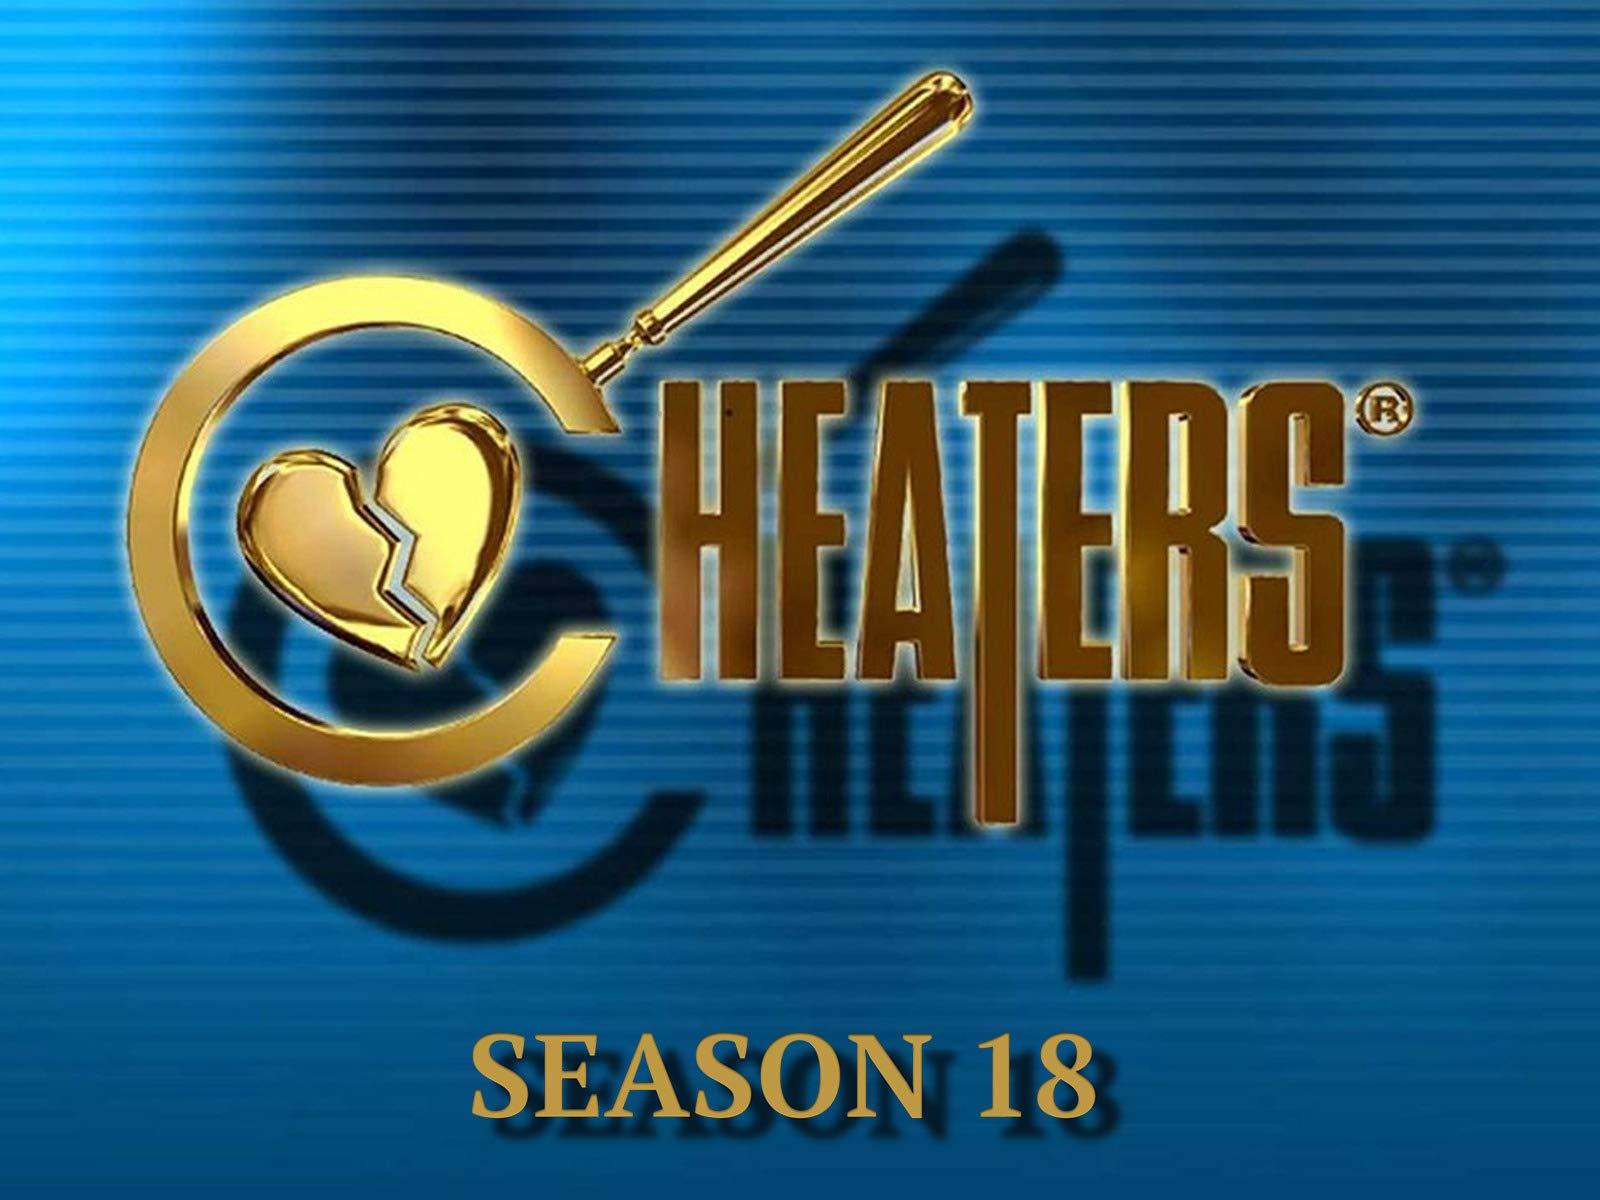 Cheaters - Season 18